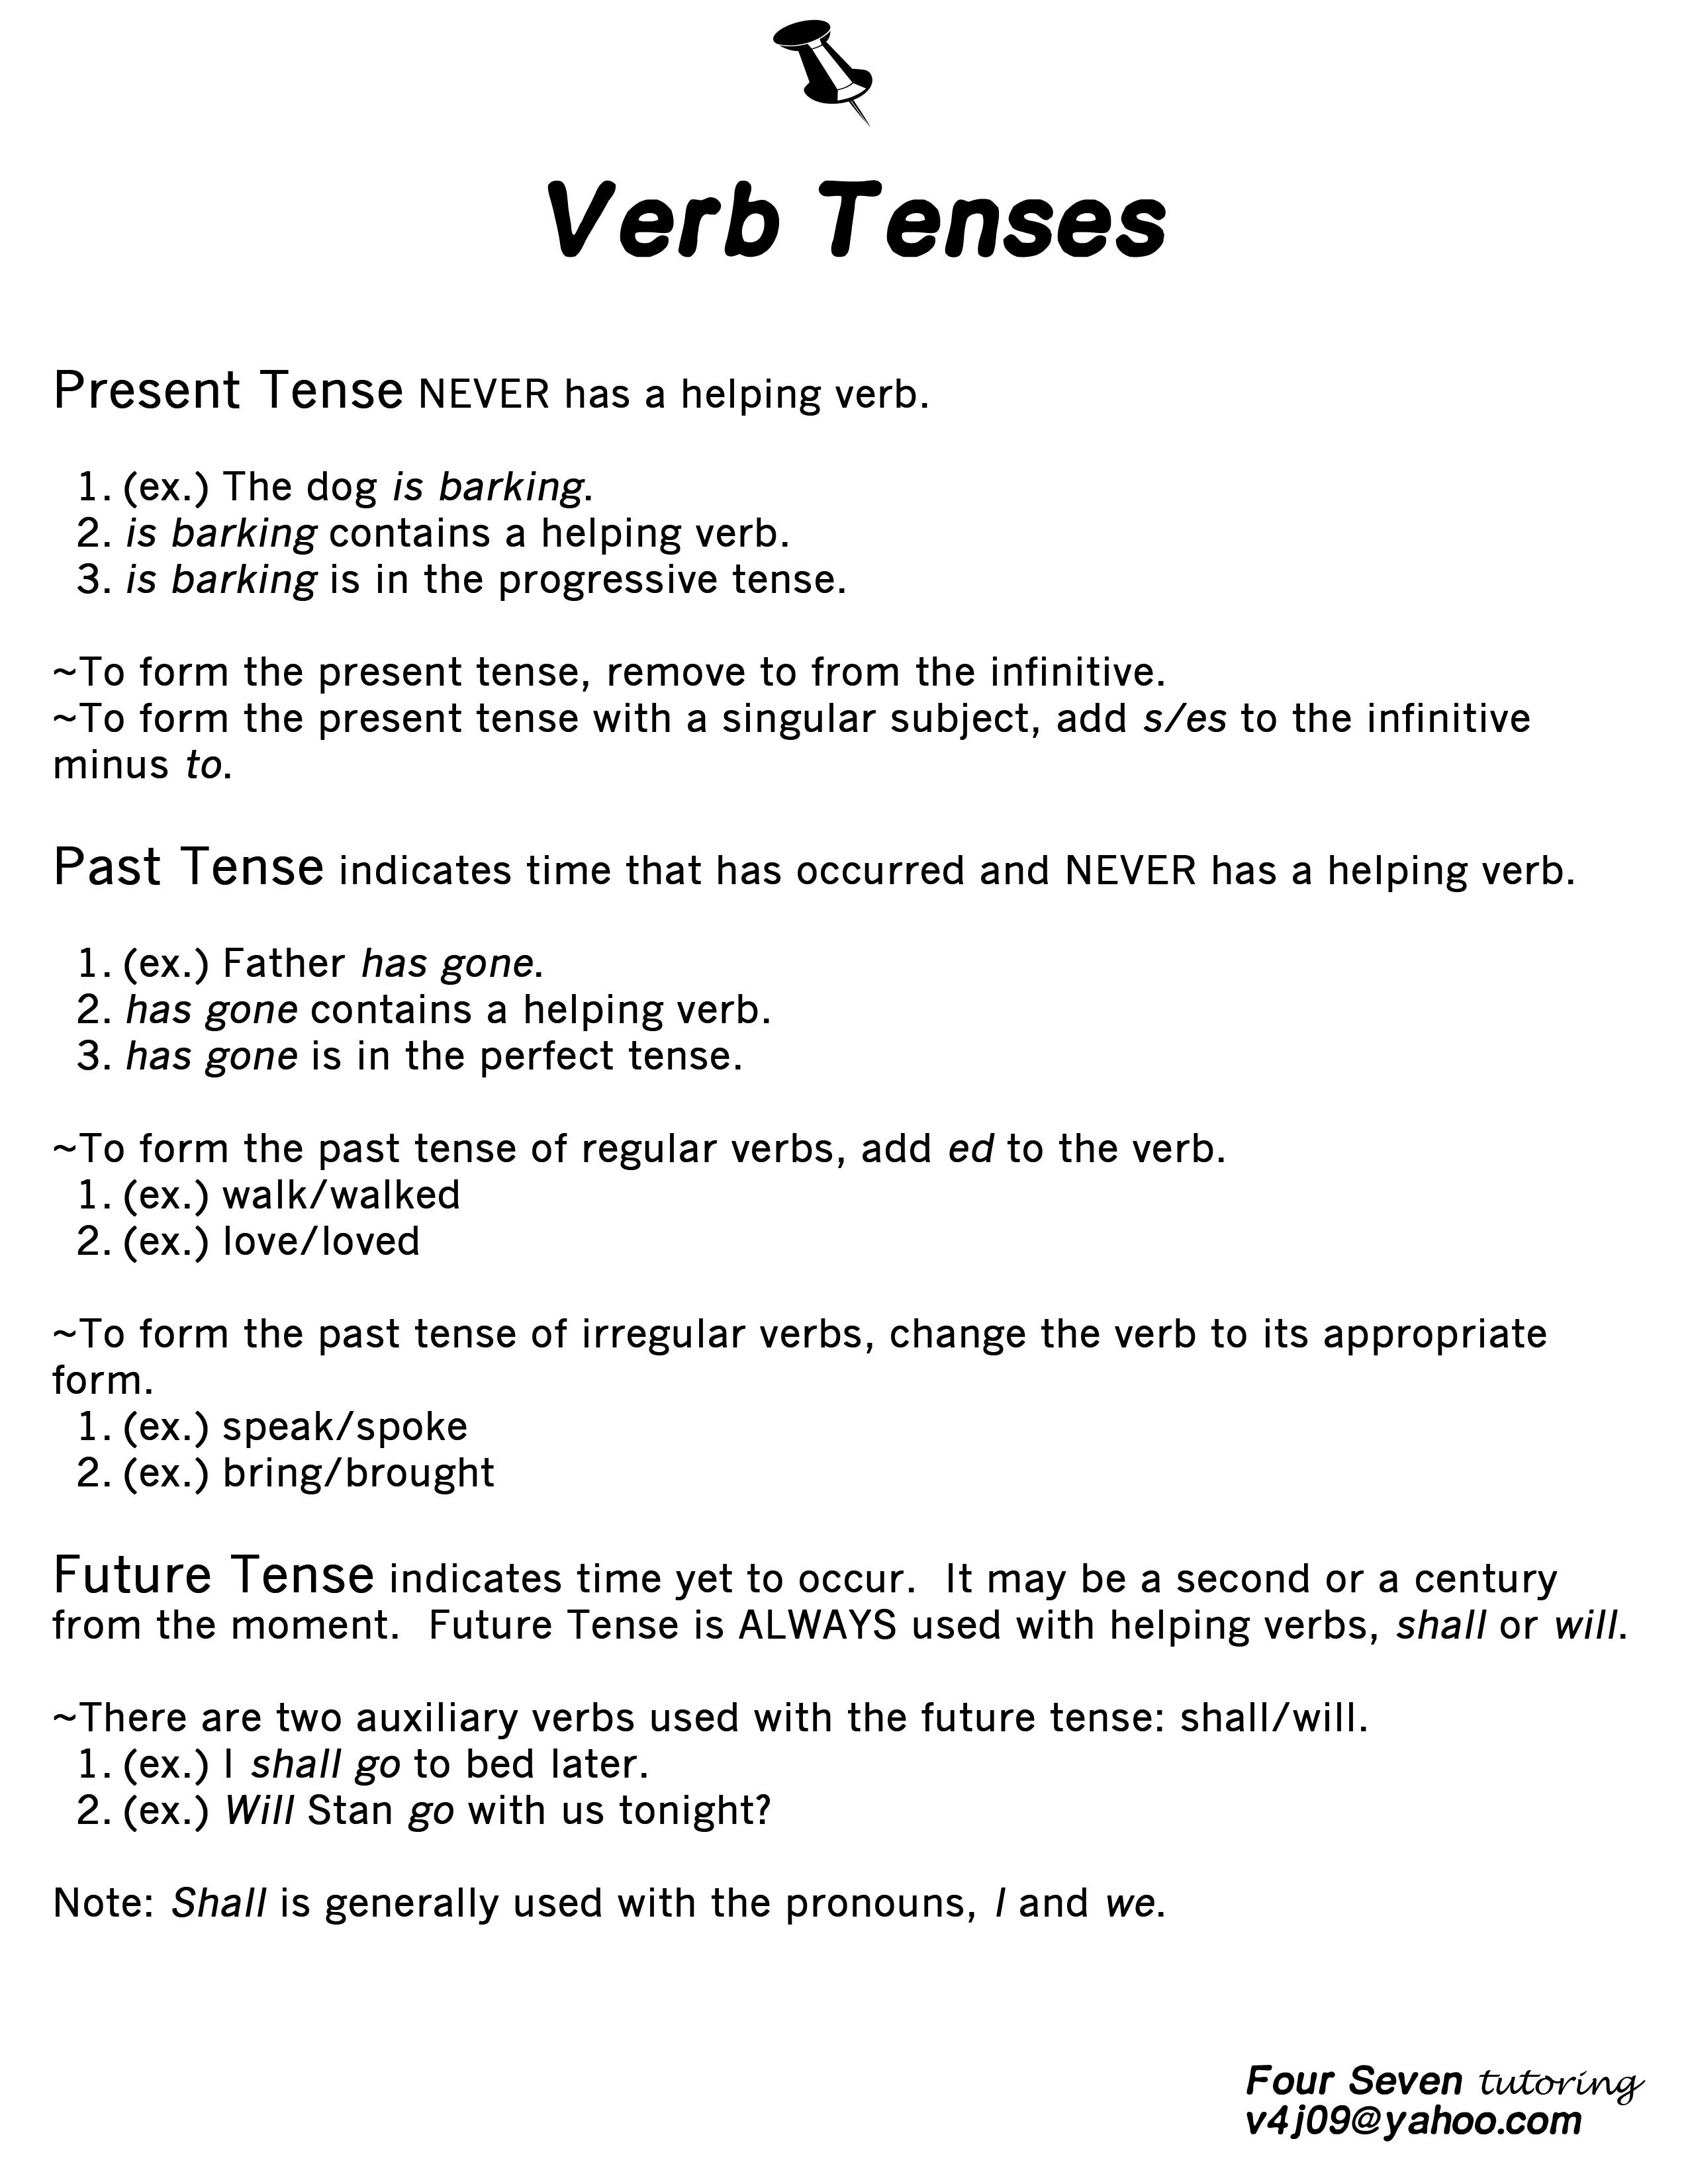 Verb Tenses Lesson 1 Resource